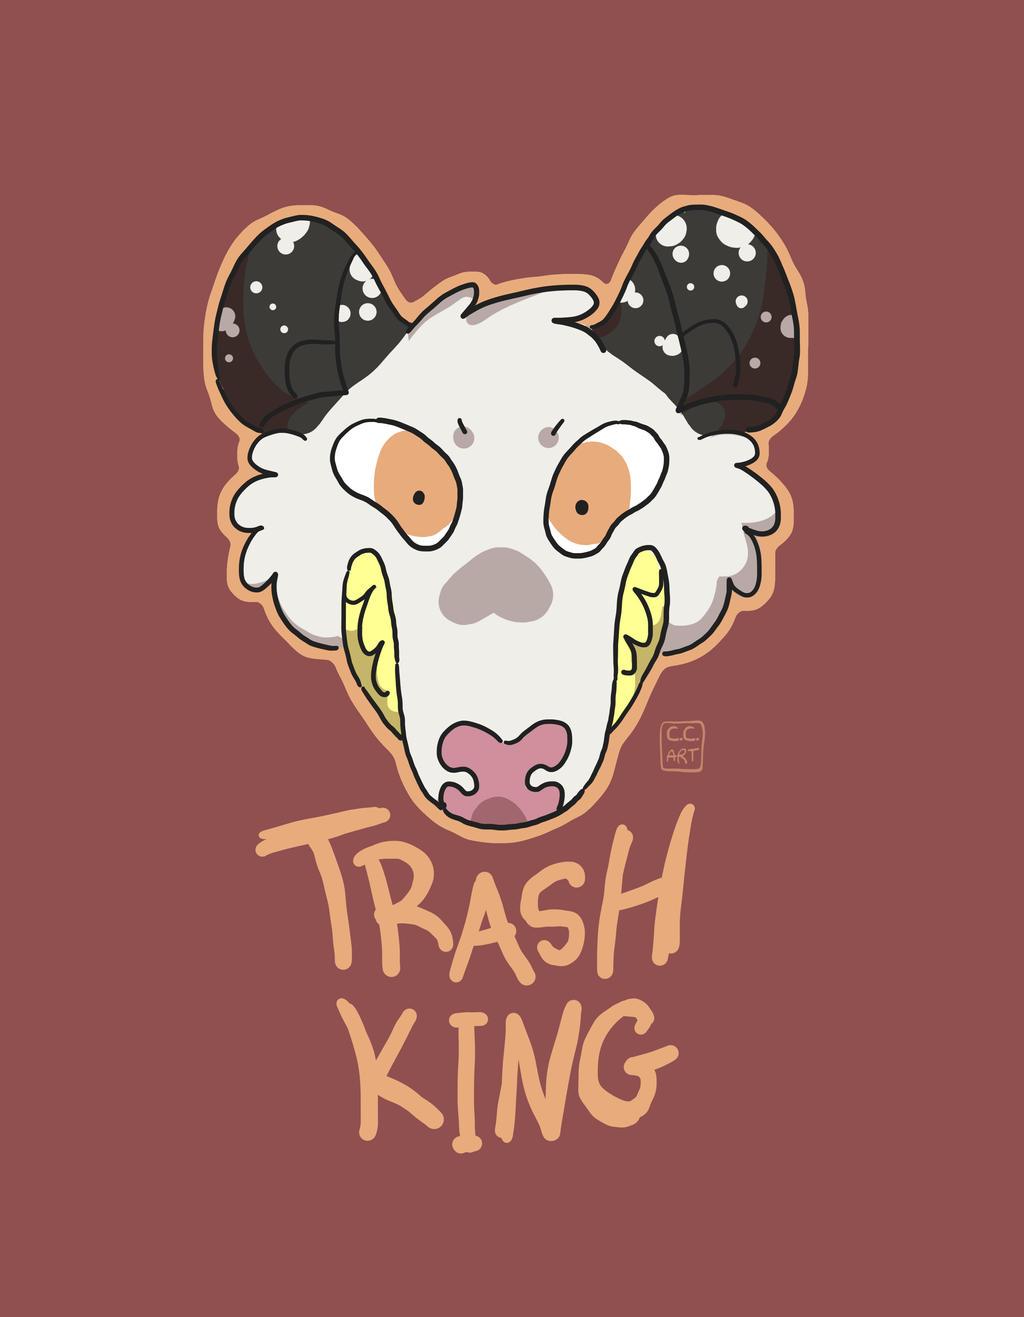 Trash King by ccartstuff